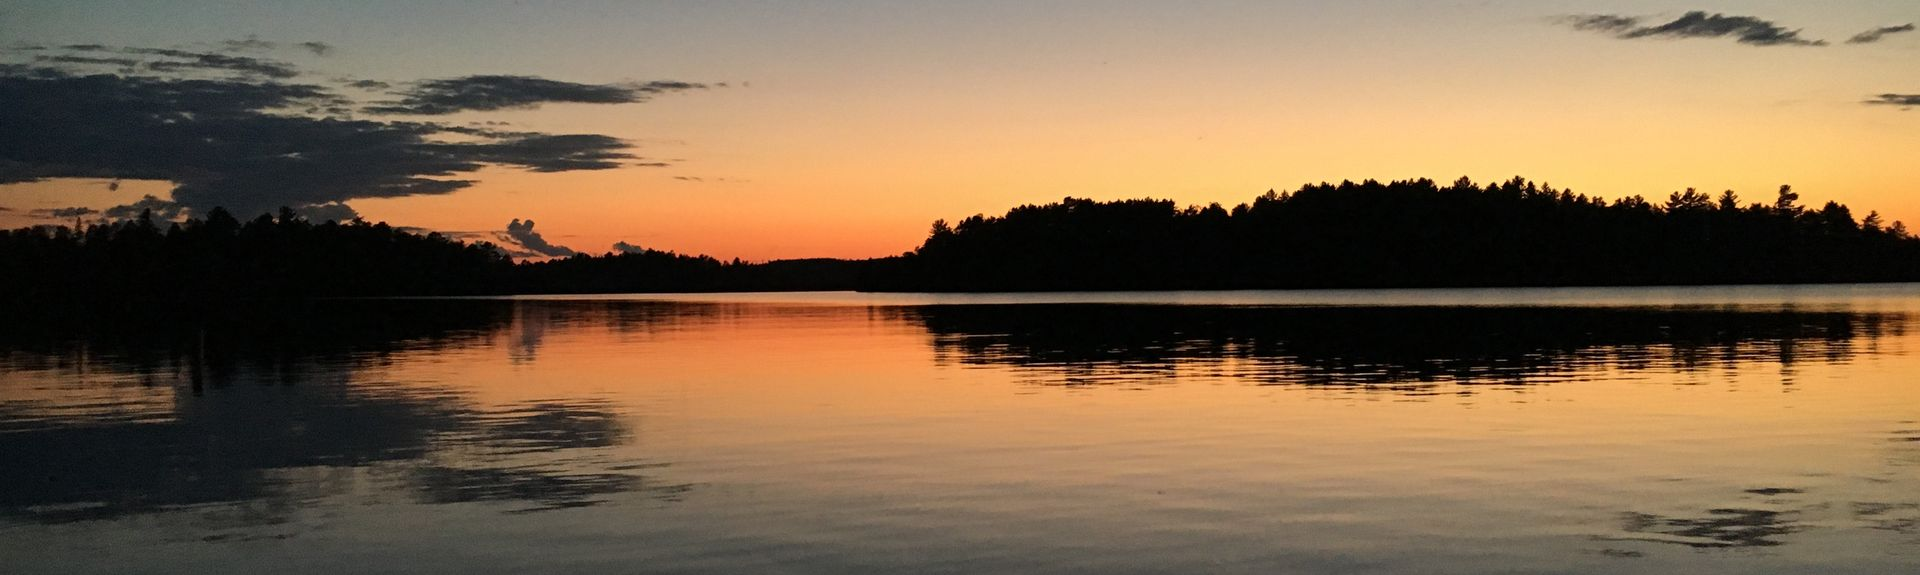 Eagles Nest Lake Number Three, Ely, Minnesota, United States of America